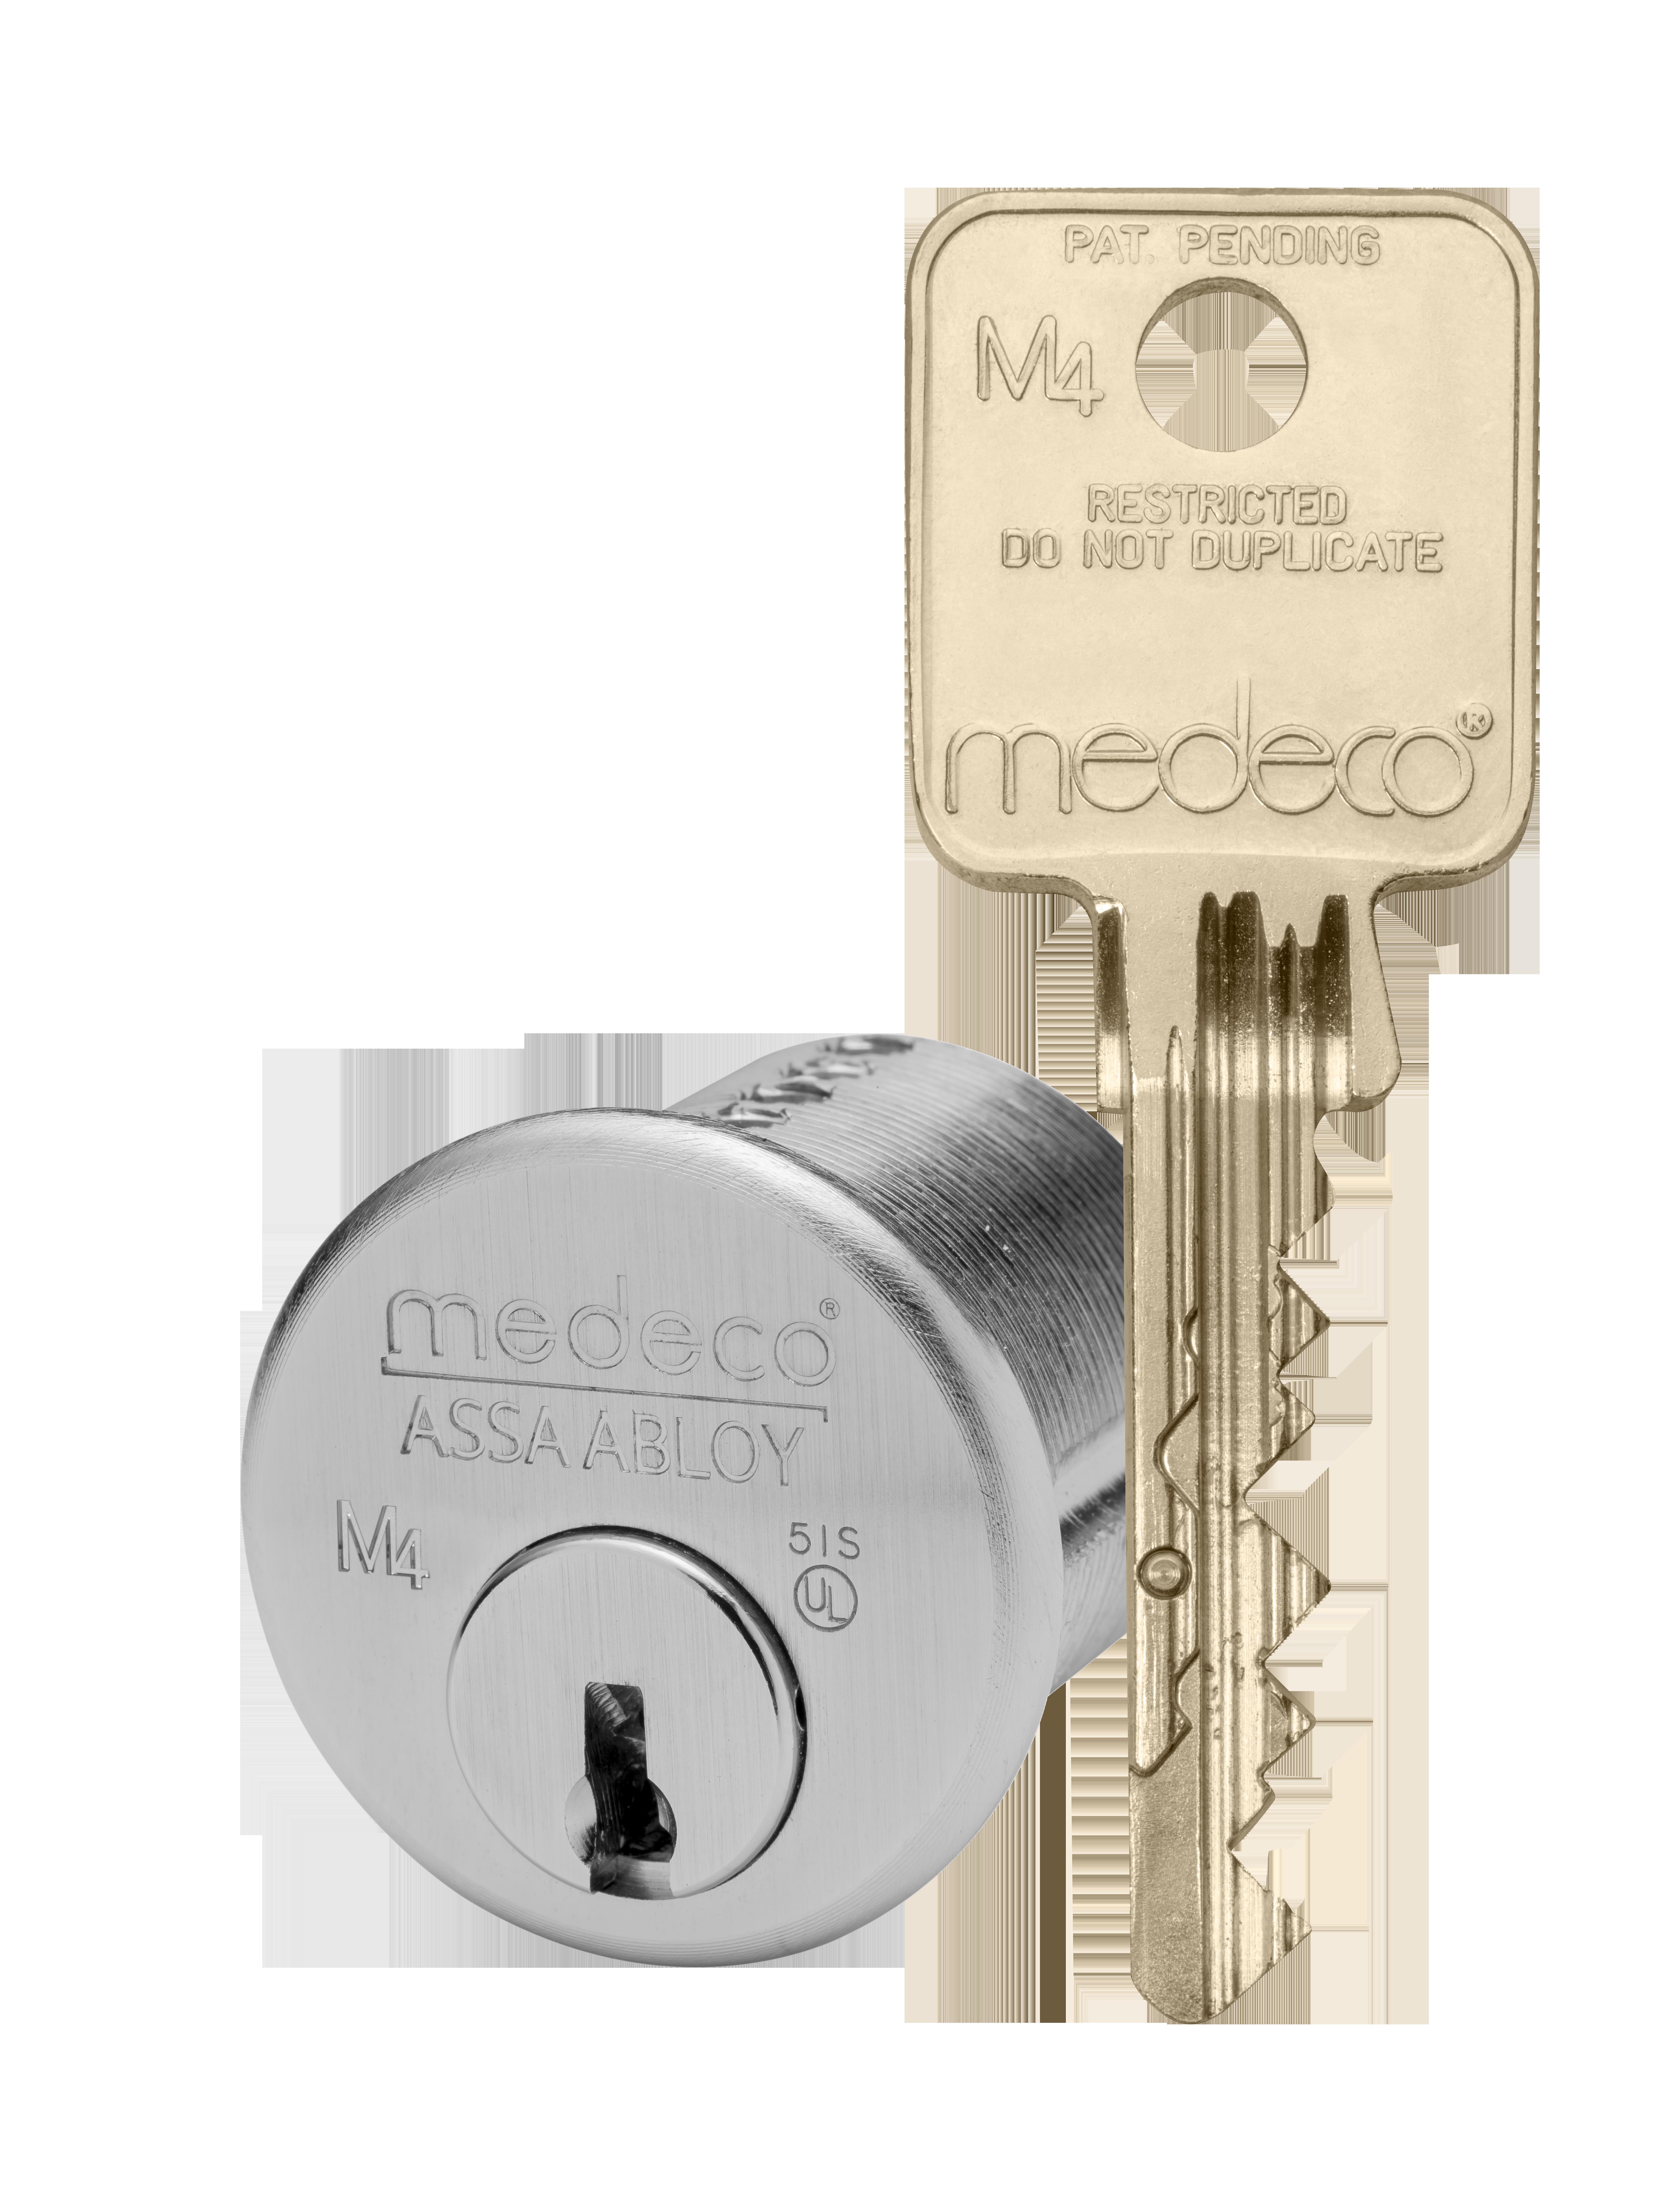 Medeco M4 cylinders